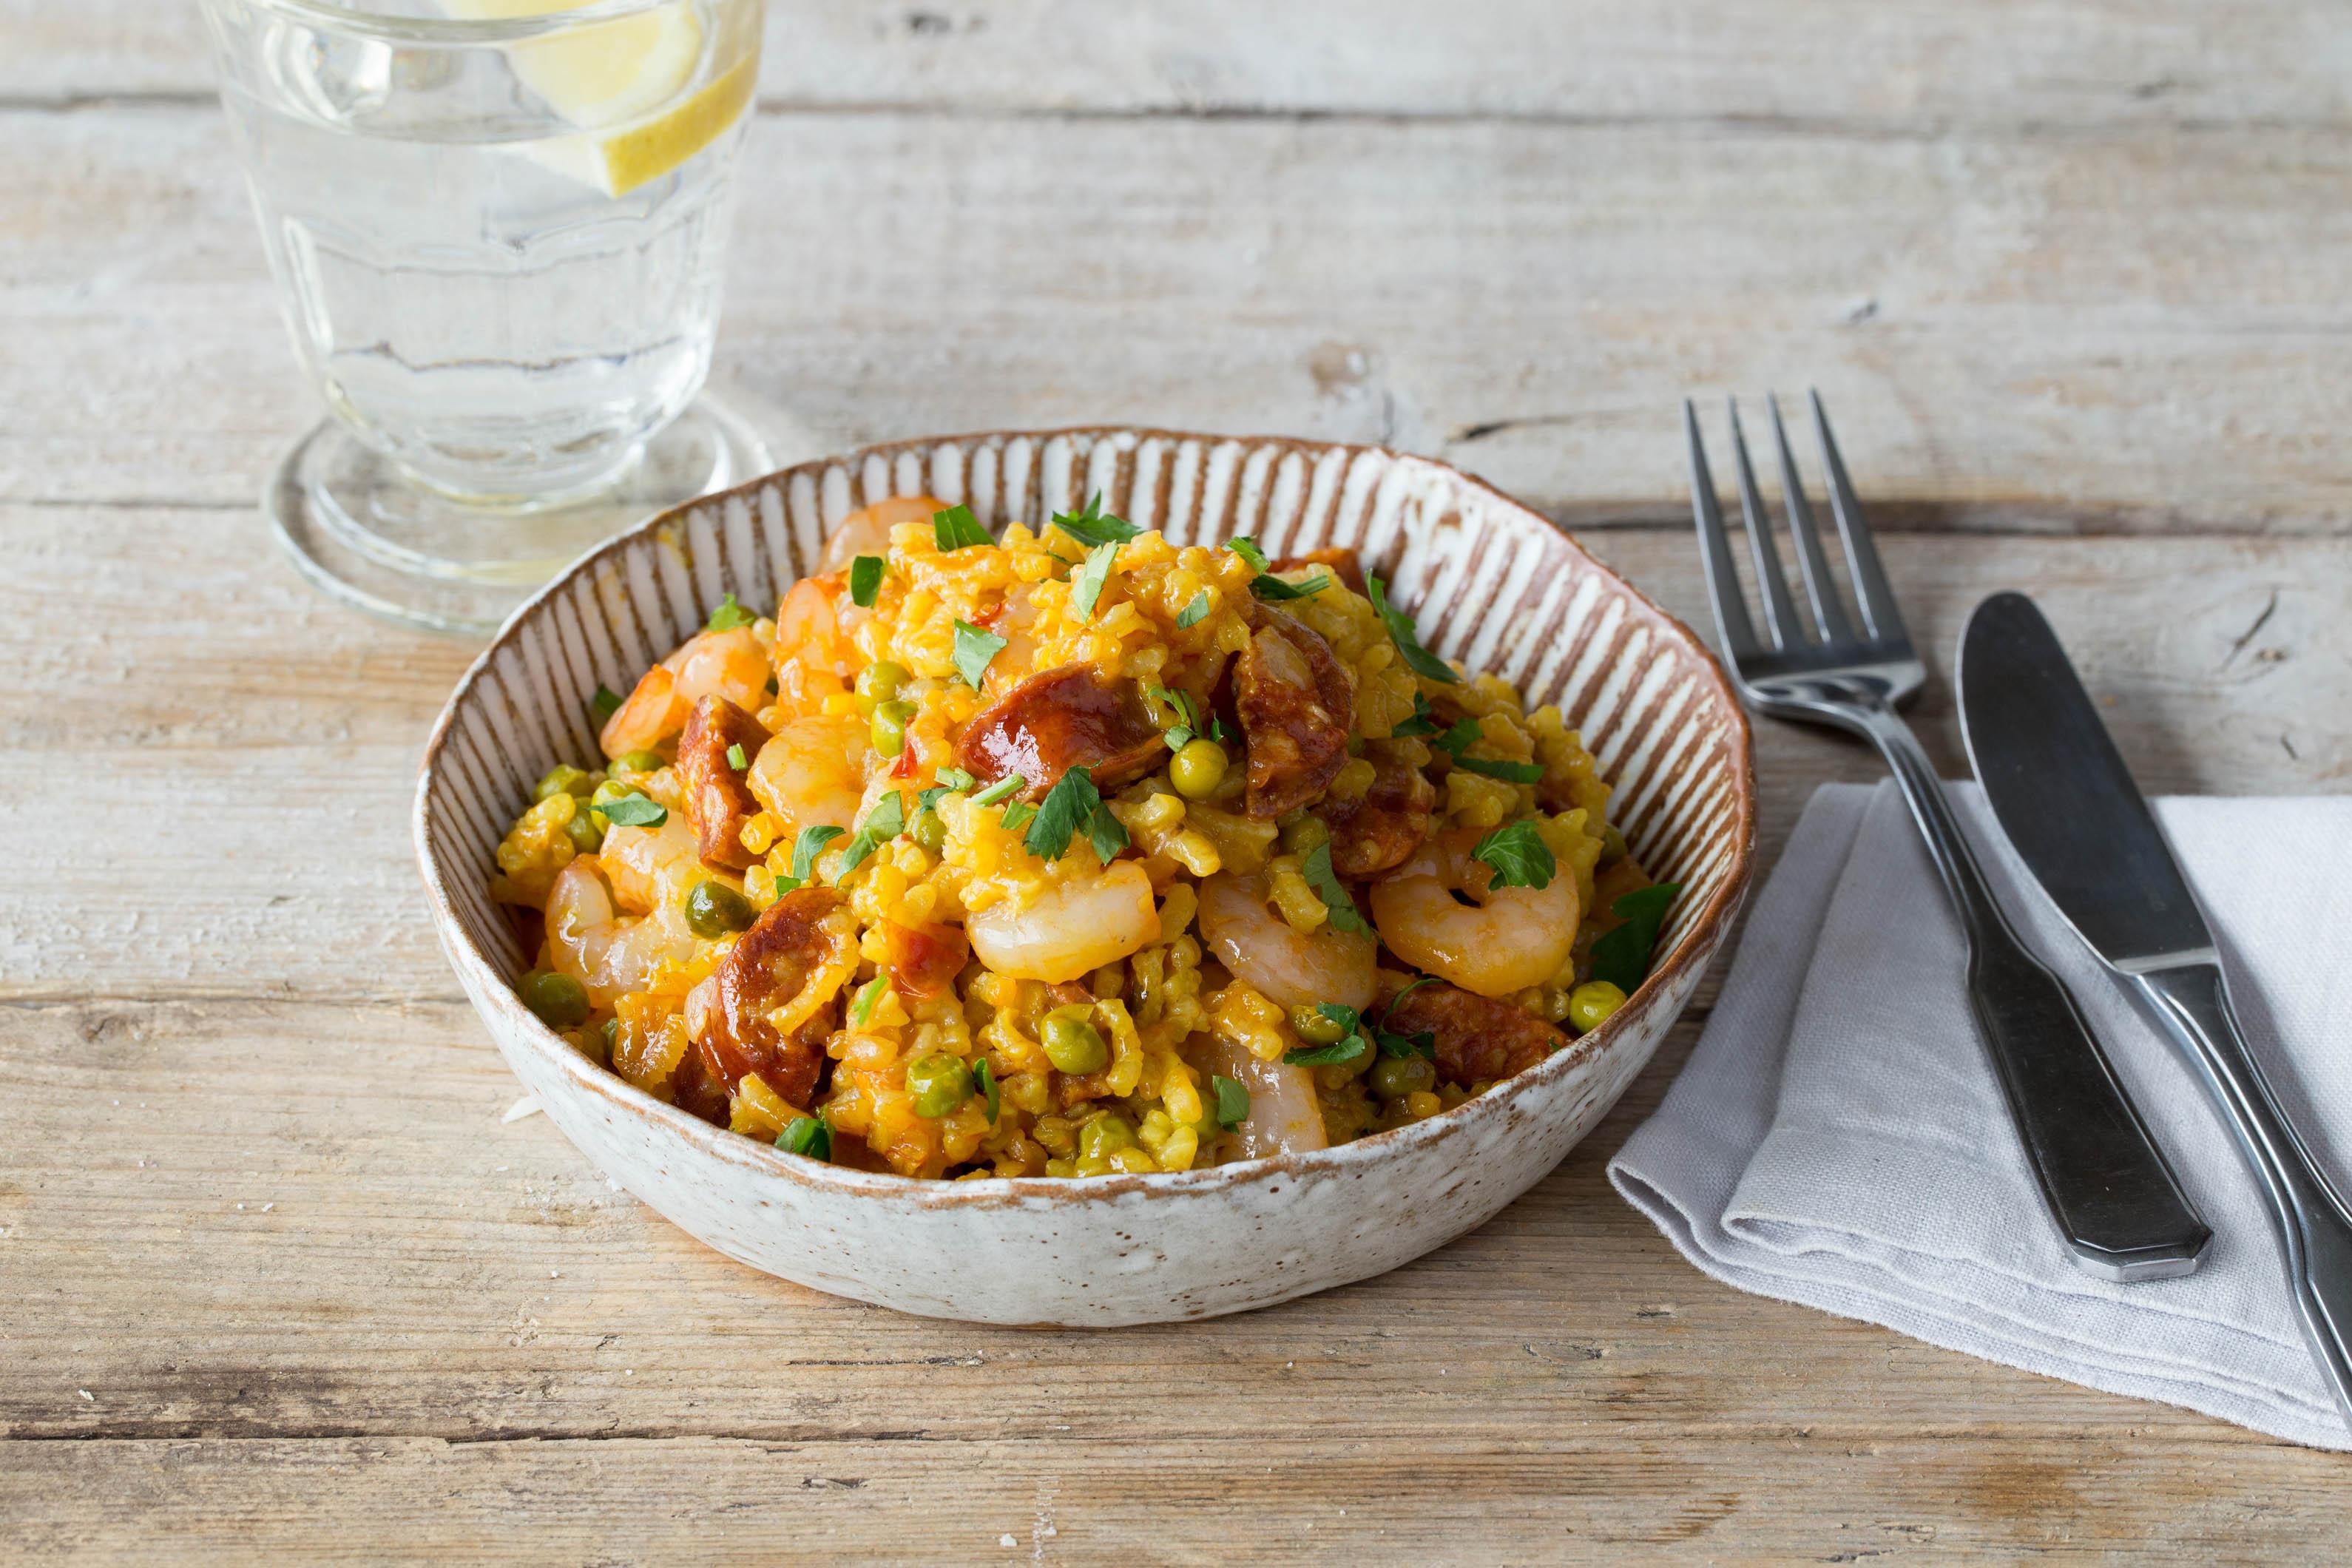 Shrimp and Chorizo Paella with Saffron, Smoked Paprika, and Peas